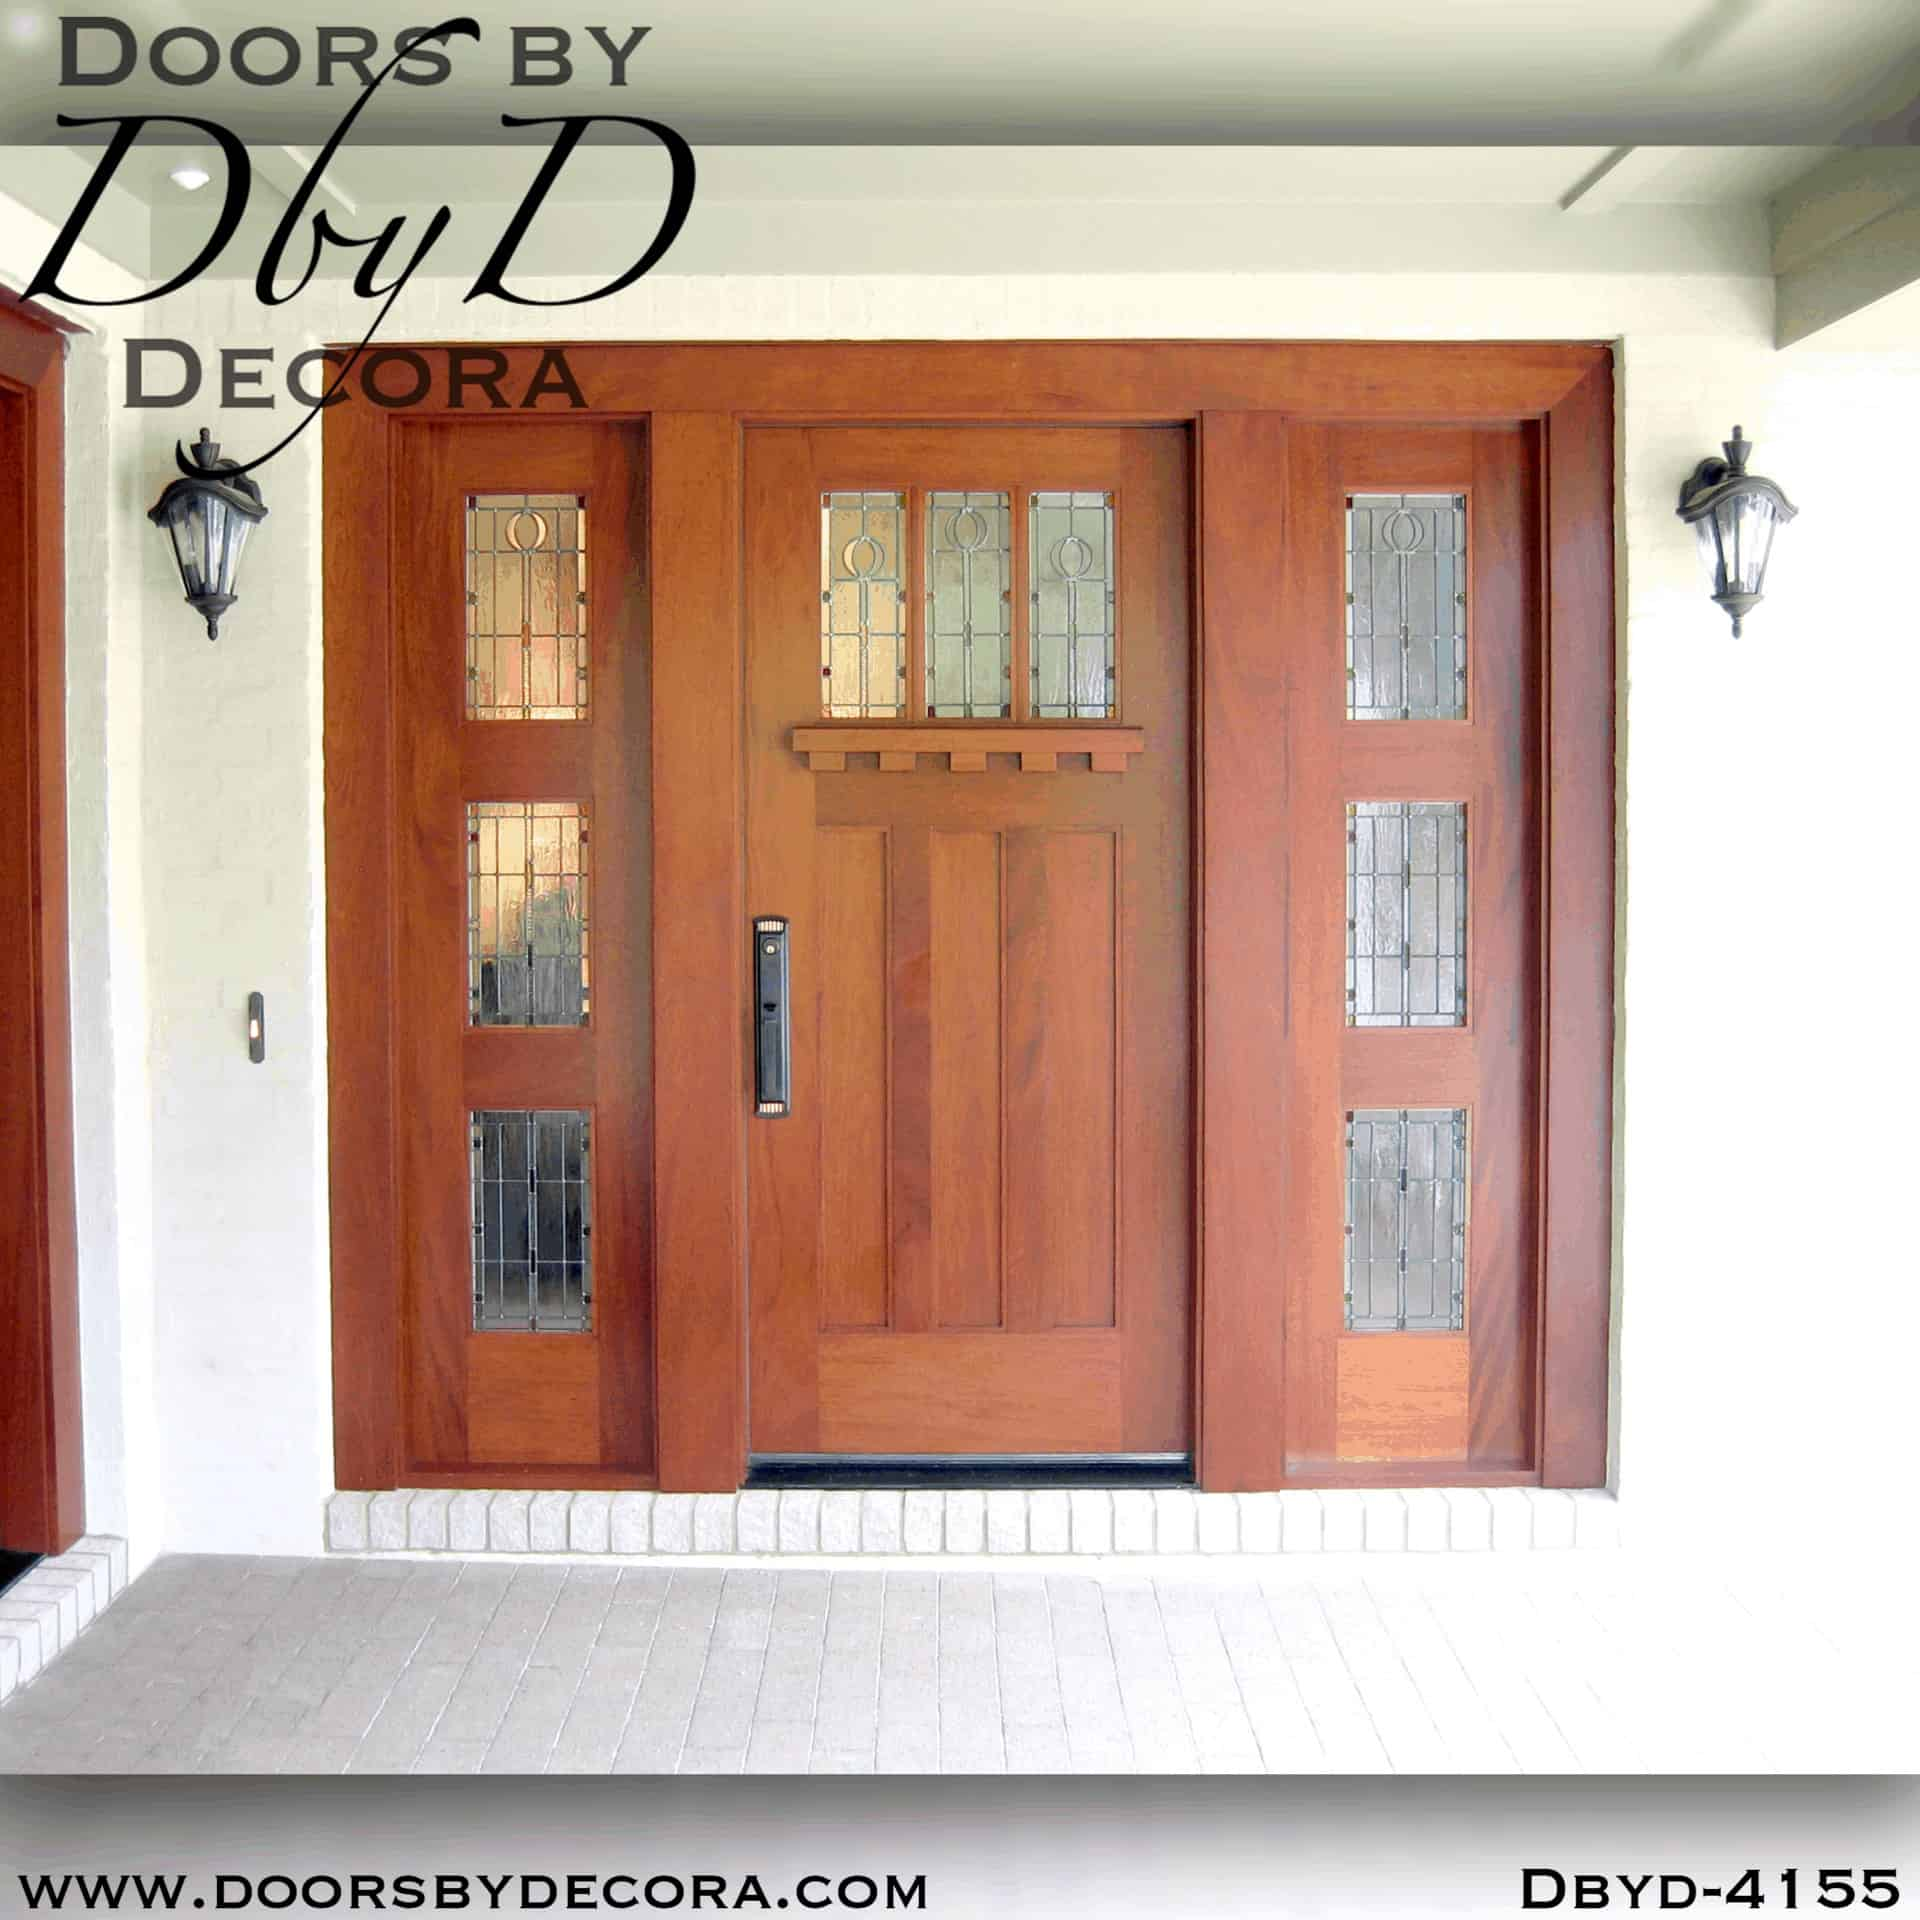 Custom Craftsman Arts And Crafts Door Wood Entry Doors By Decora